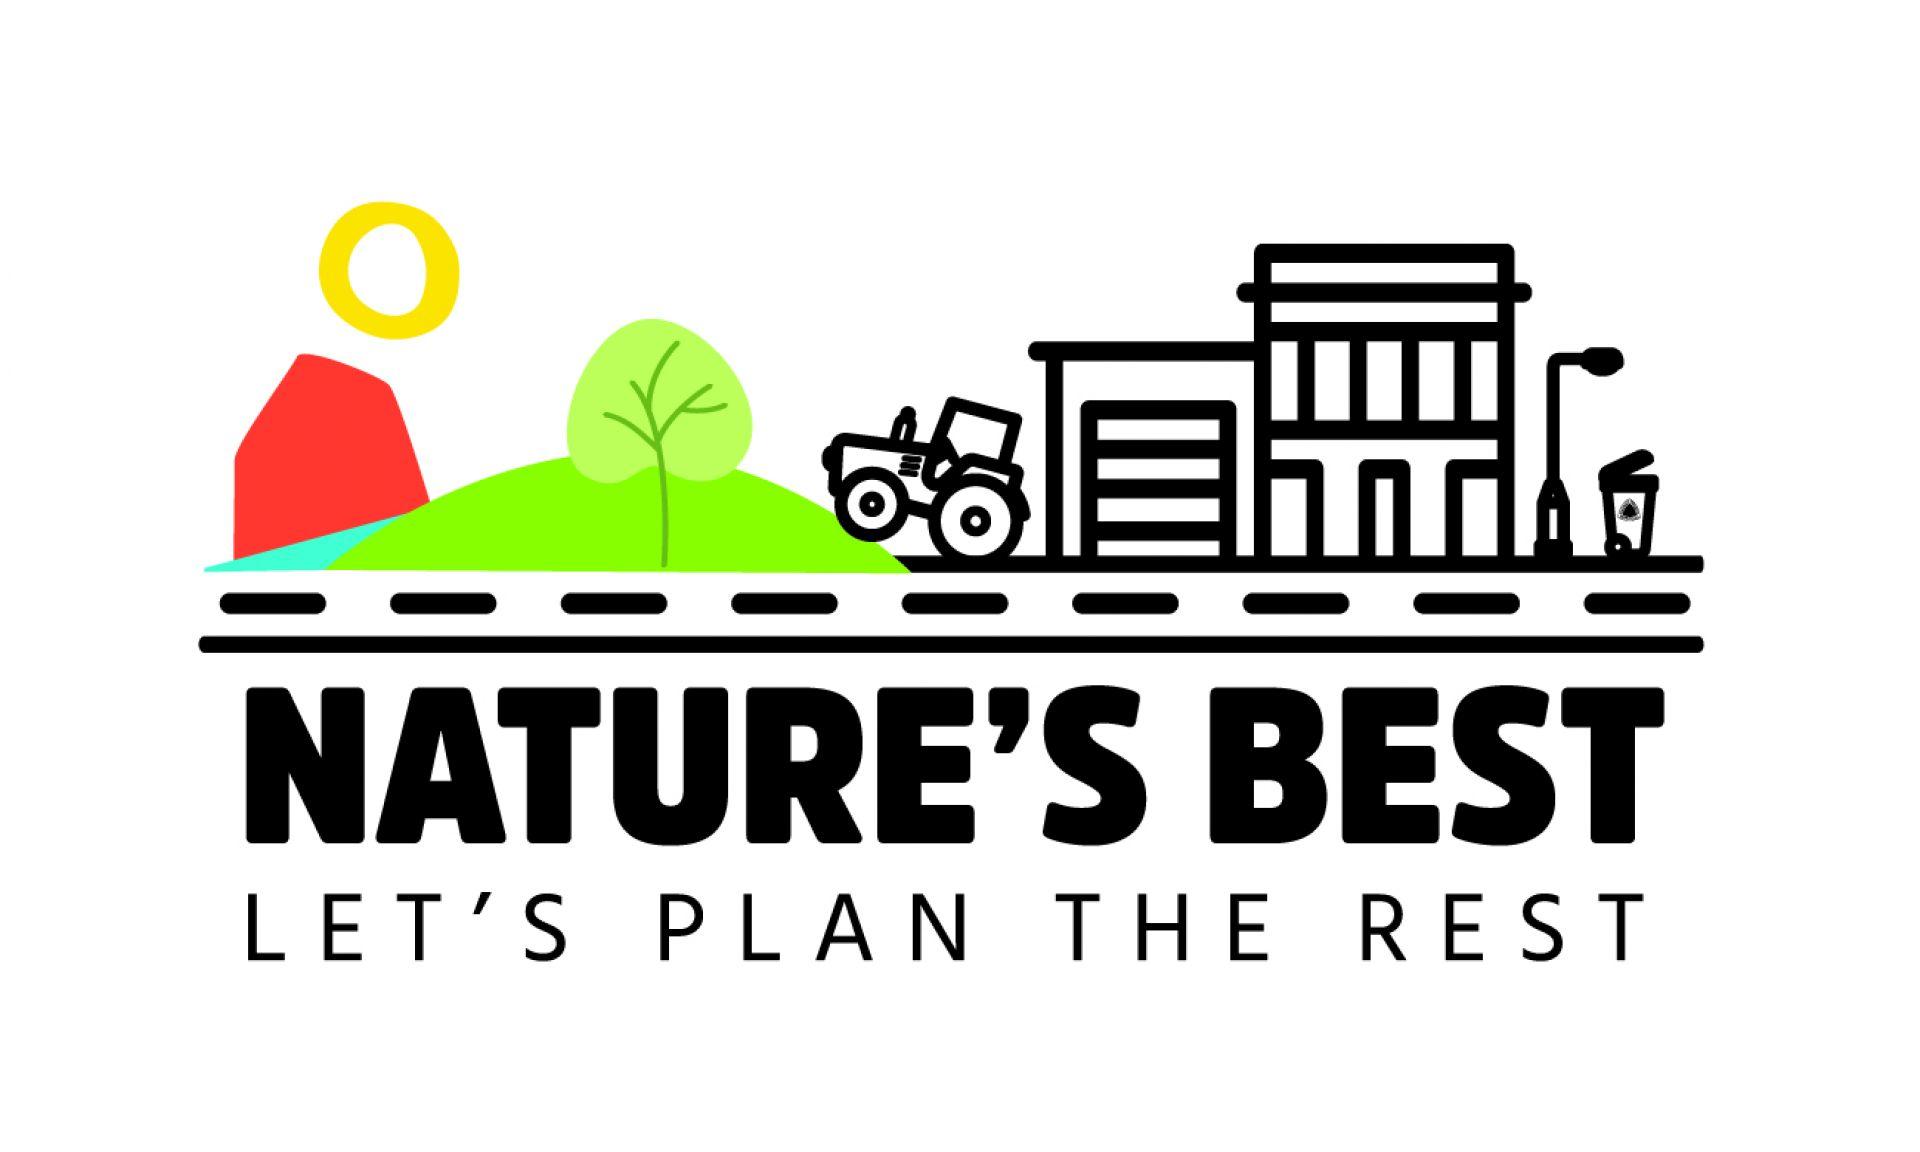 Nature's Best, Let's Plan The Rest